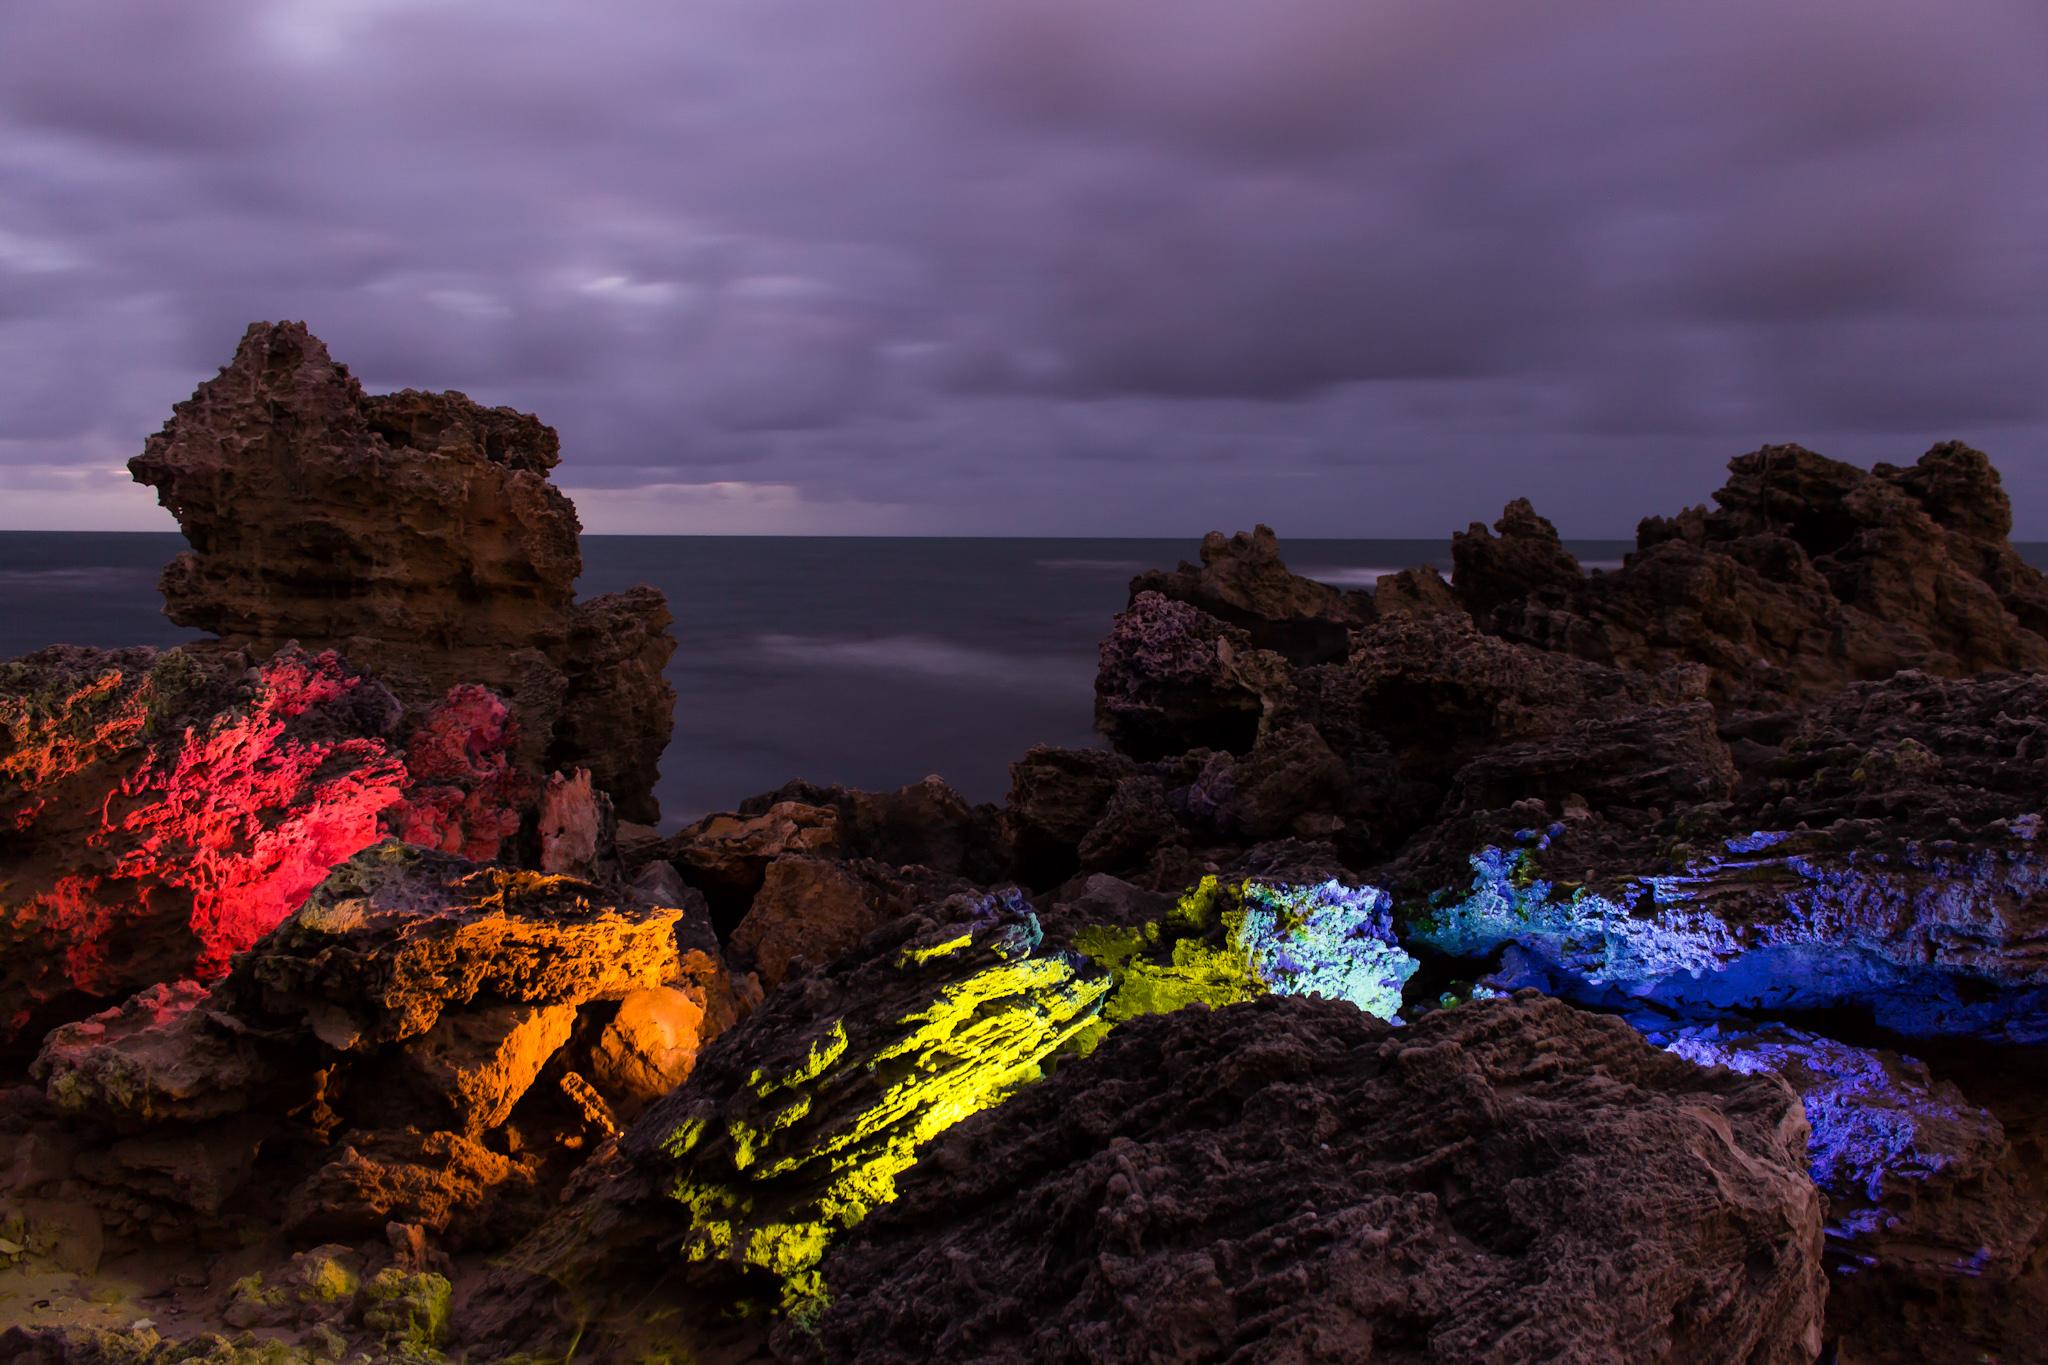 an experimental long exposure shot taken at Point Peron, Western Australia